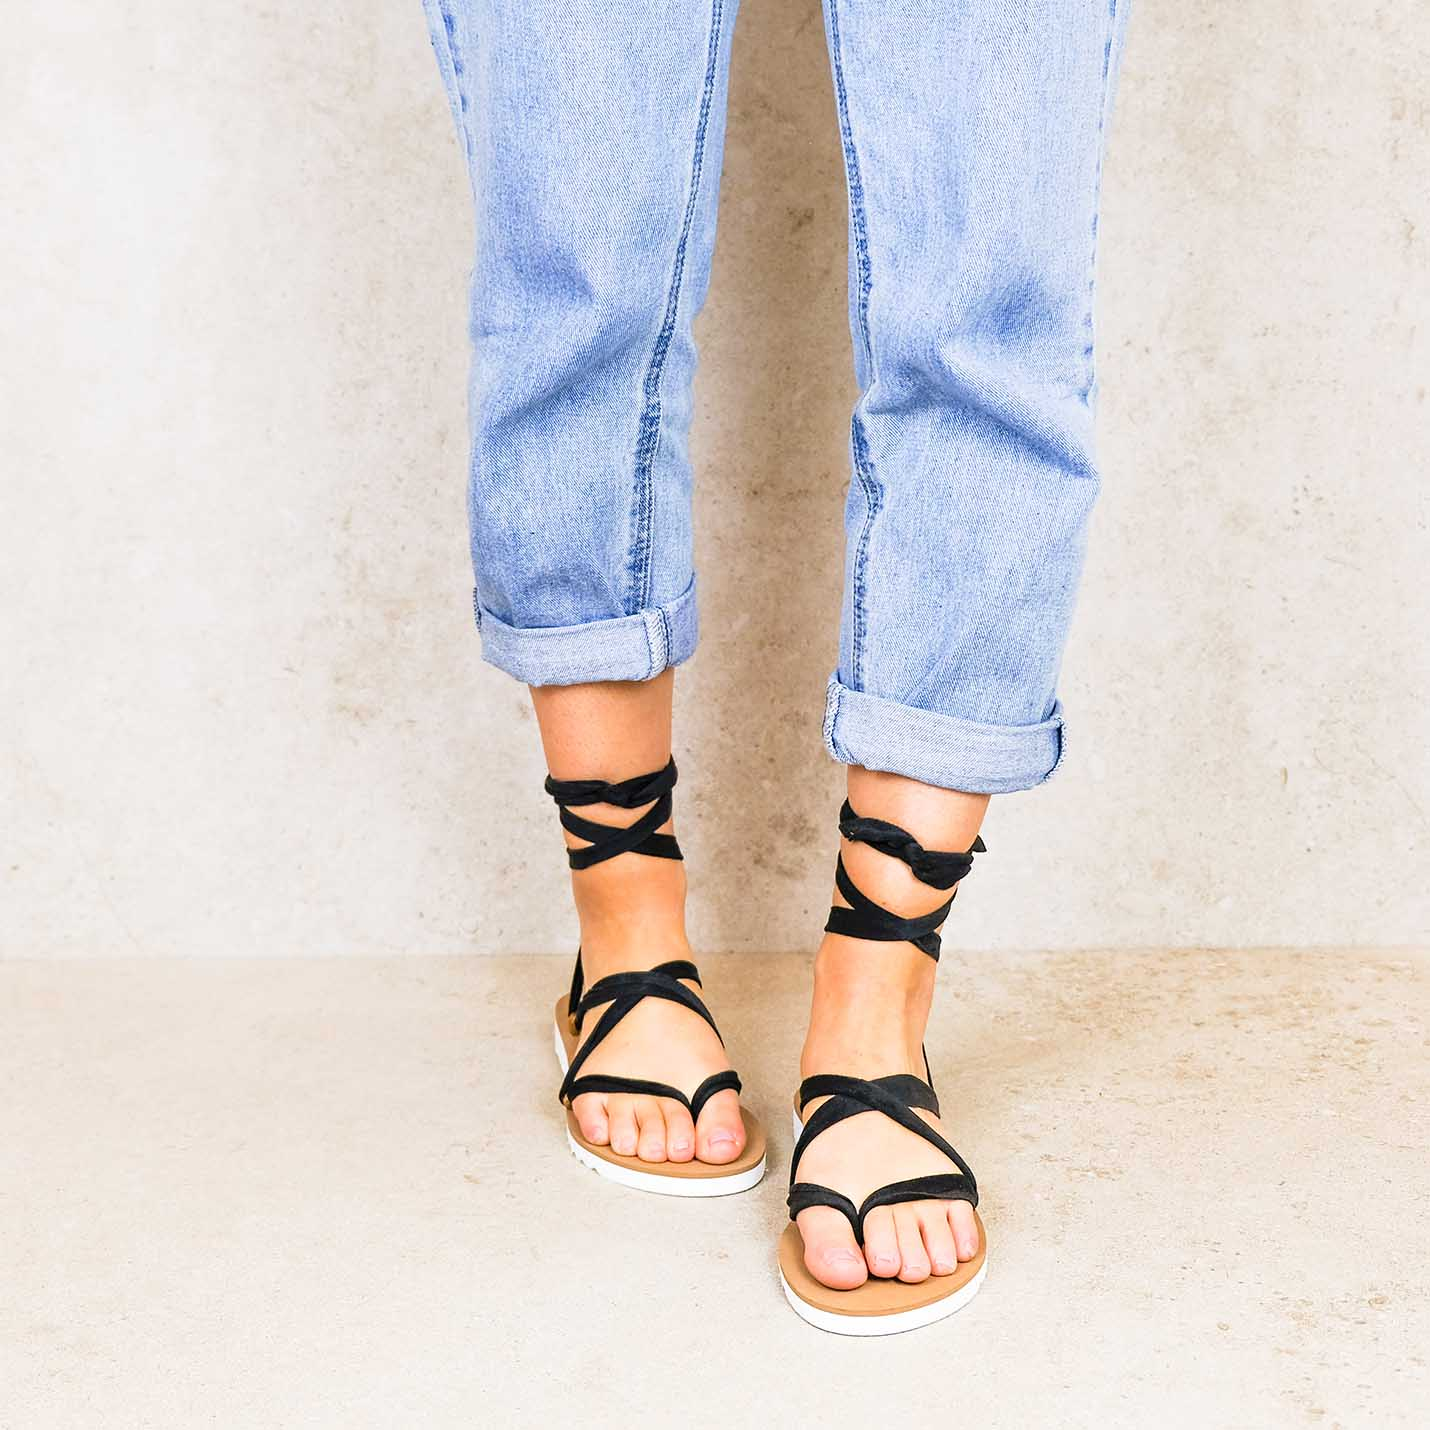 Chalco-vegan-2_lintsandalen sandals travelsandals vegan sustainable sandals wikkelsandalen